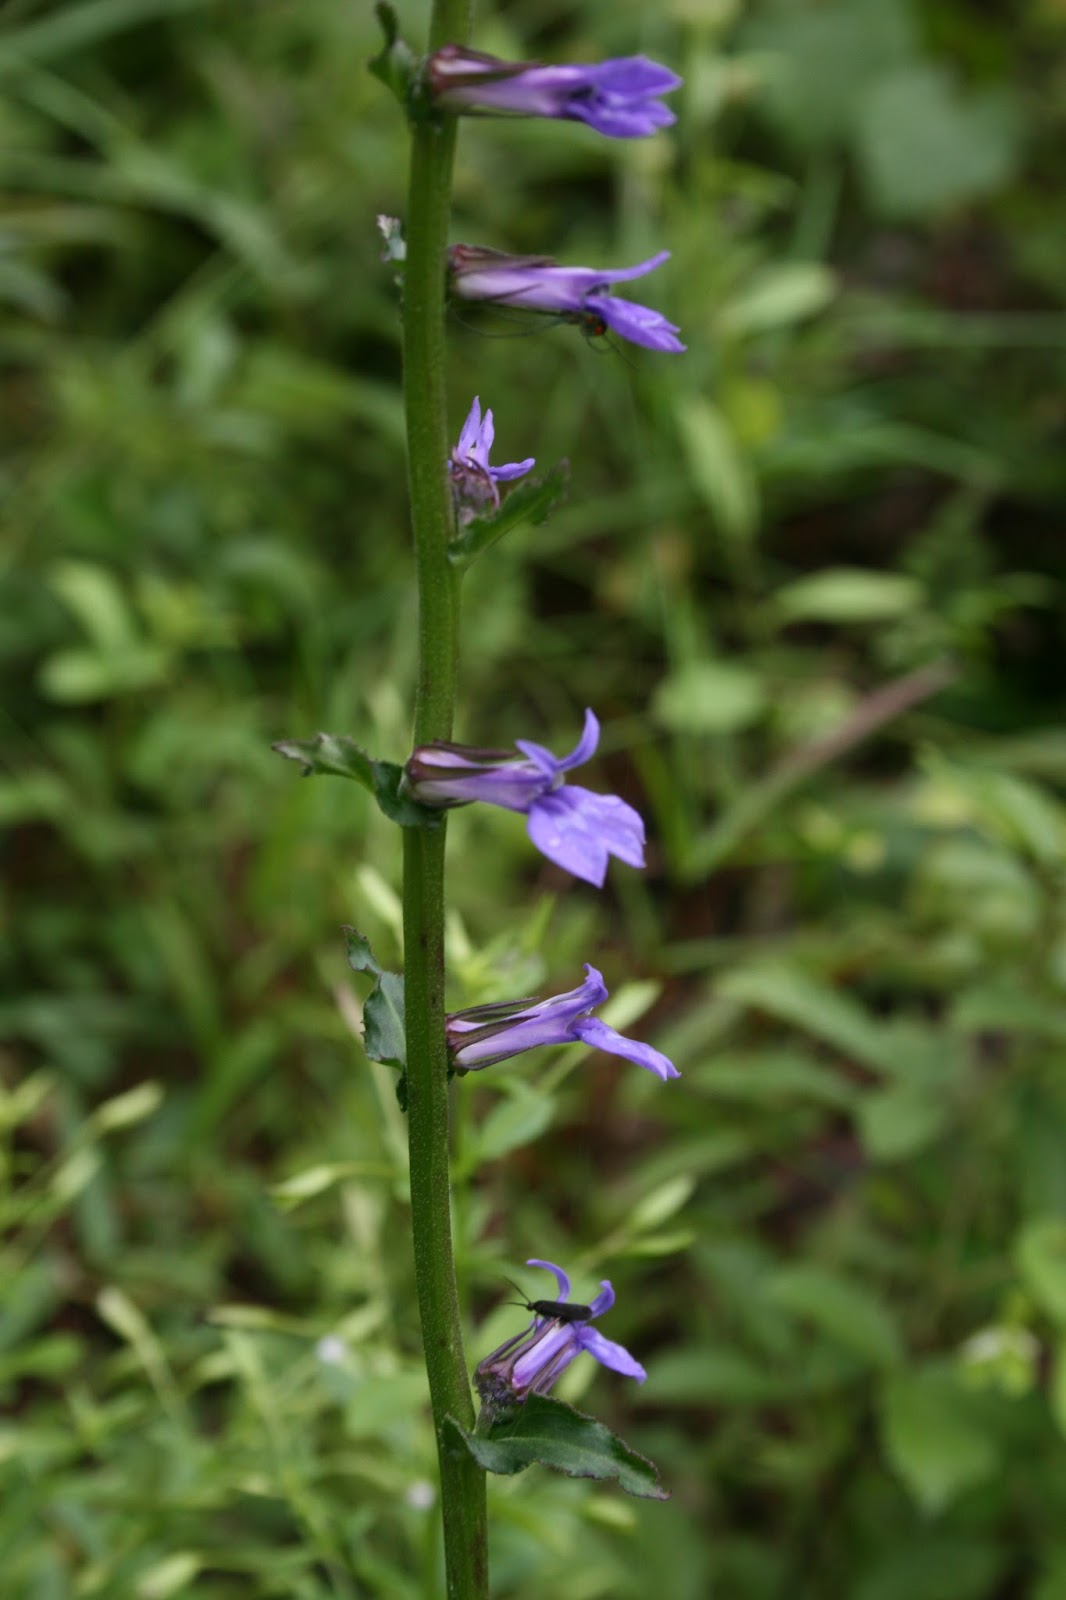 Native Florida Wildflowers: Downy Lobelia - Lobelia puberula